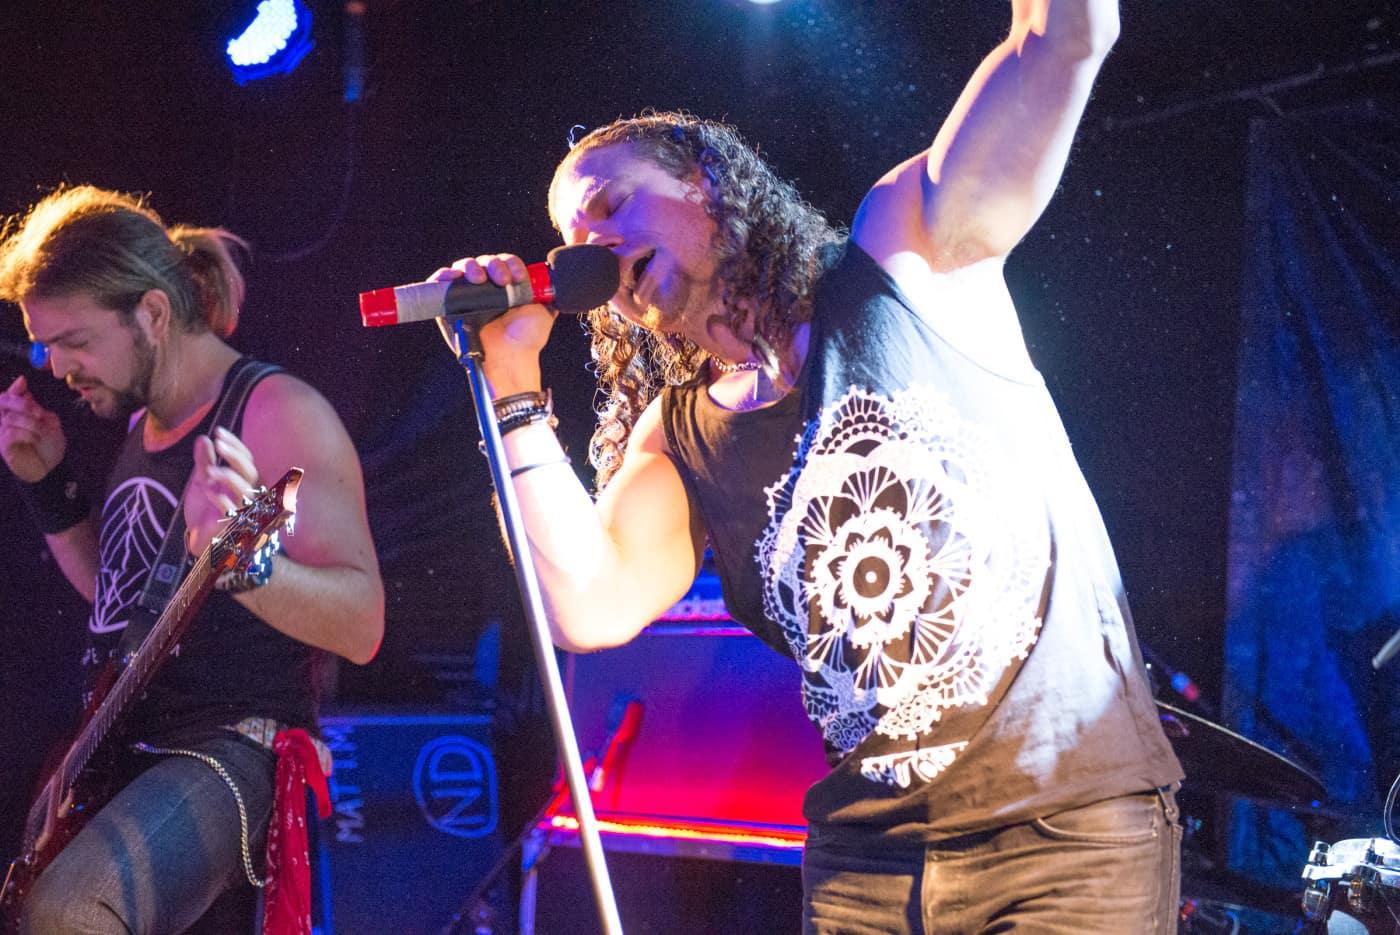 Camden Rocks Presents: New Devices @ The Barfly, Camden